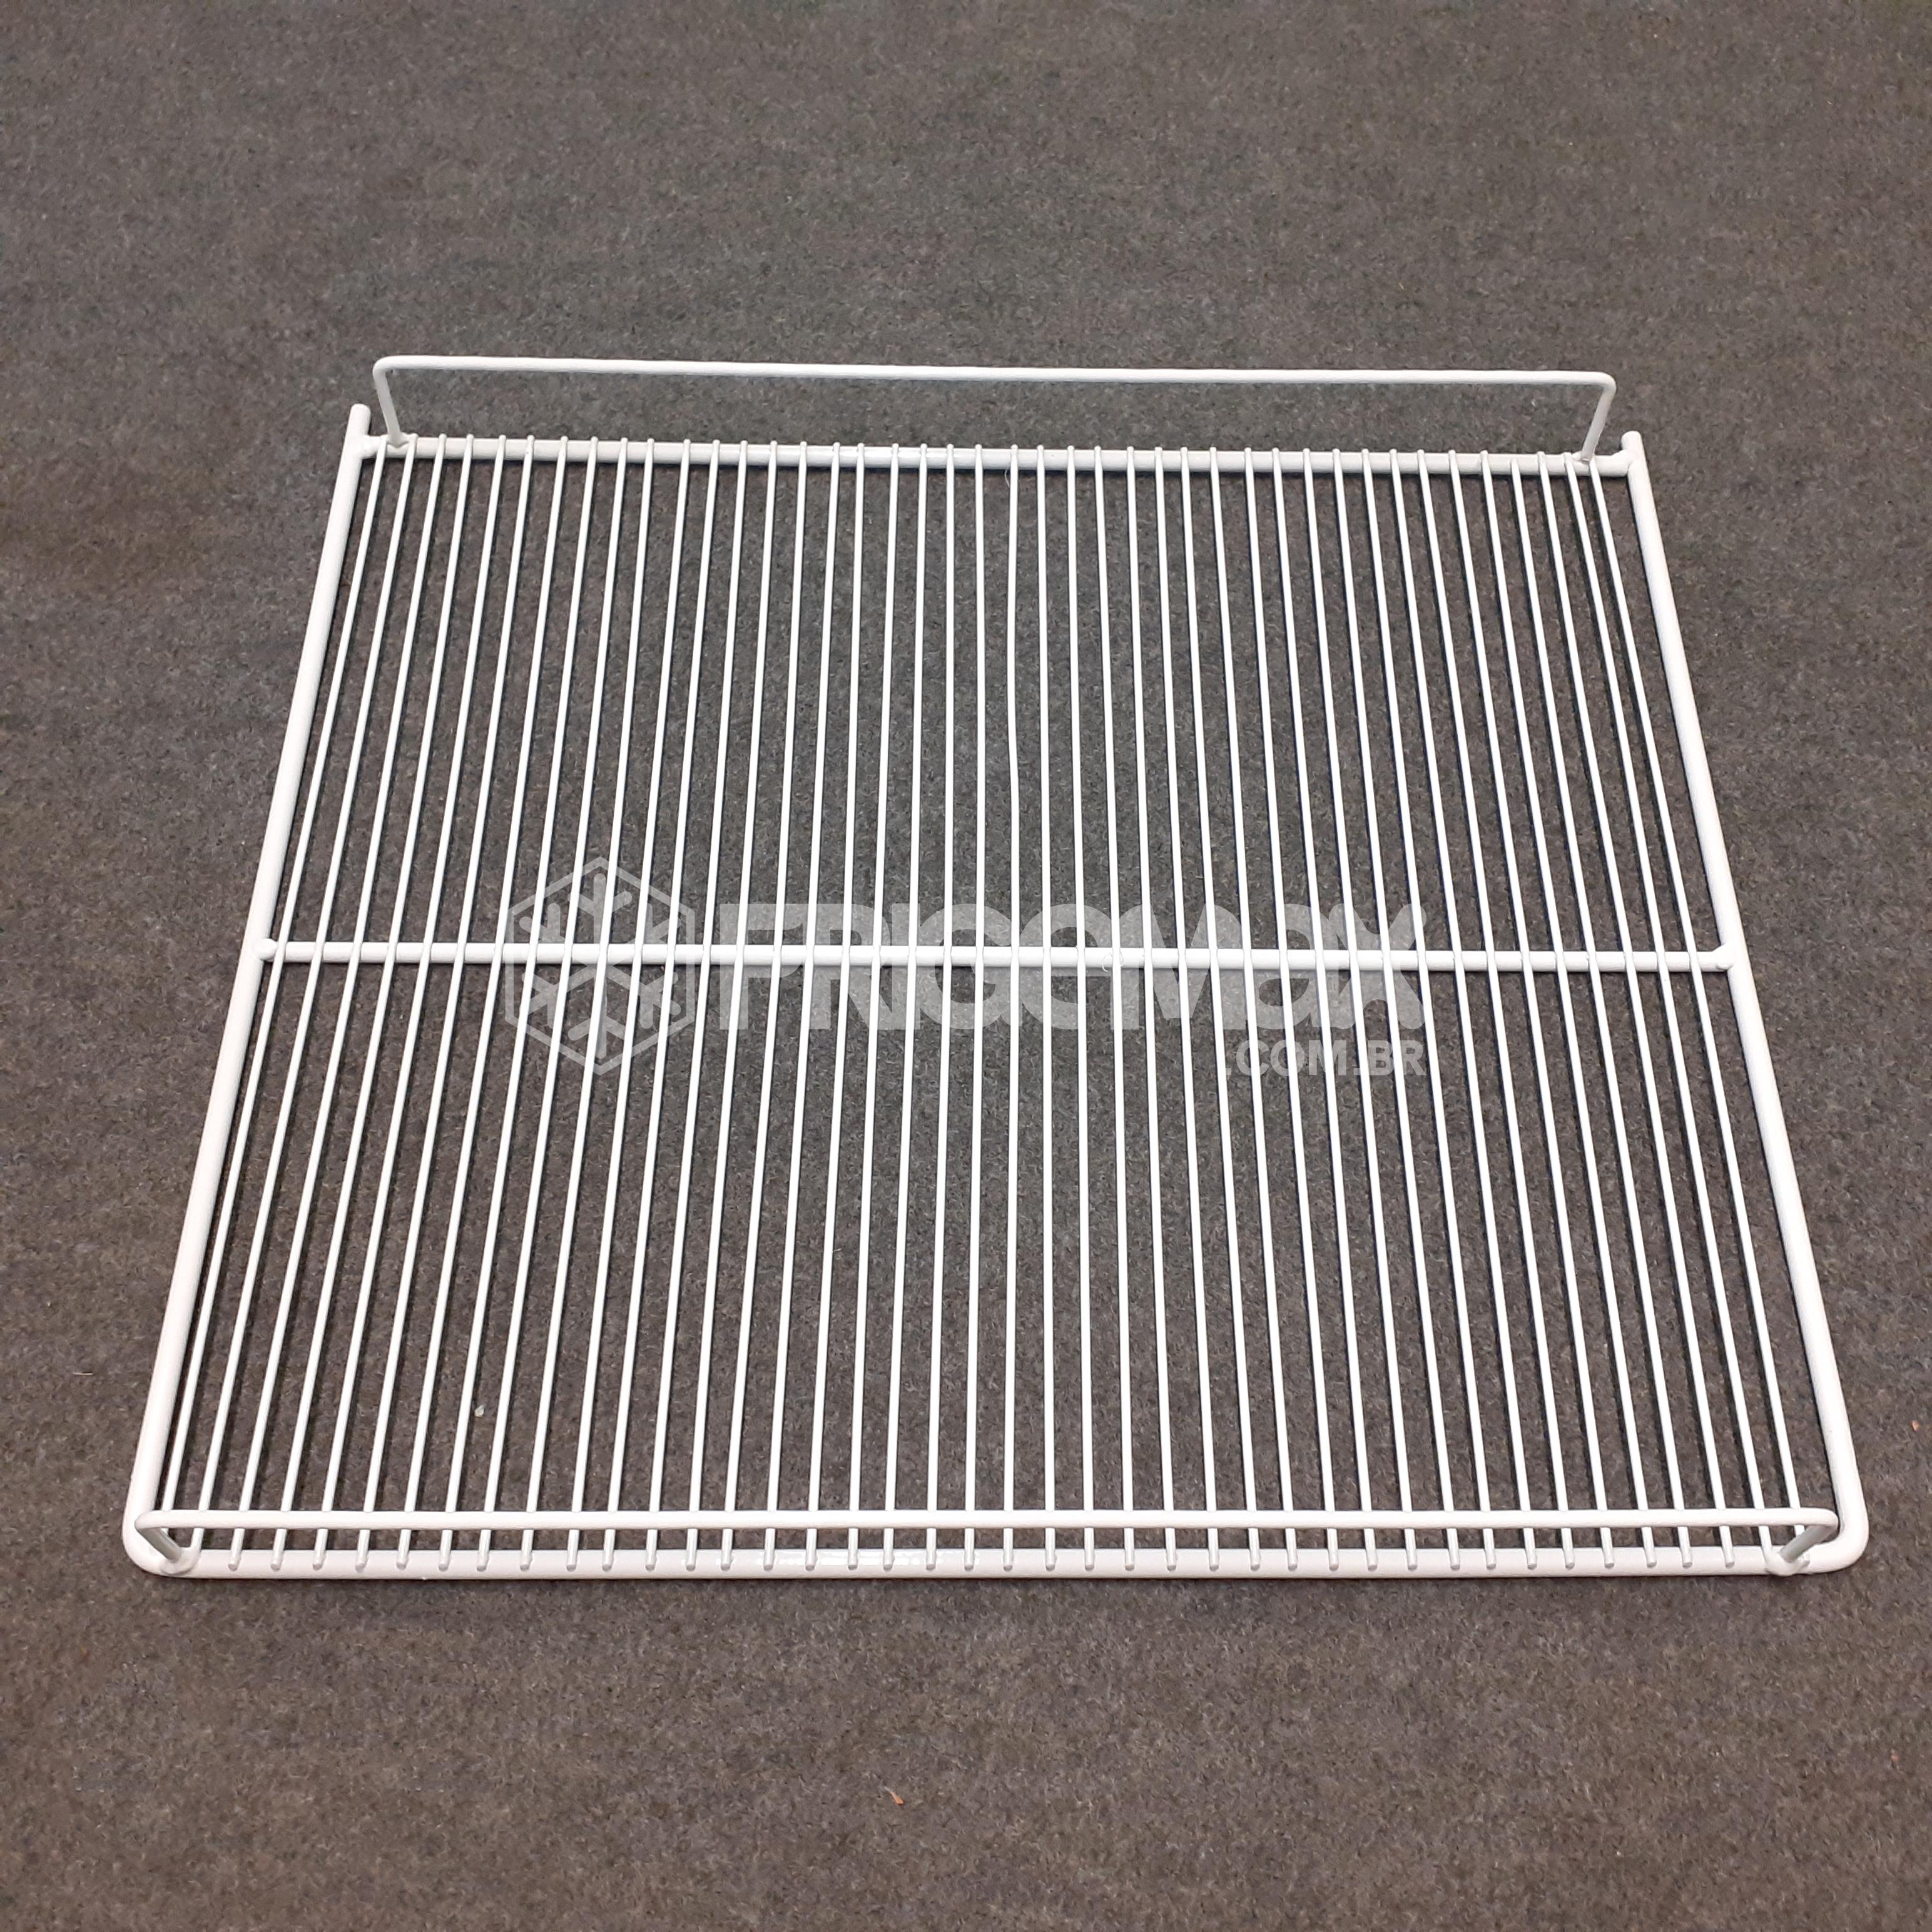 Prateleira Metalfrio 54x46cm c/ 4 suporte (VB40, VB43)